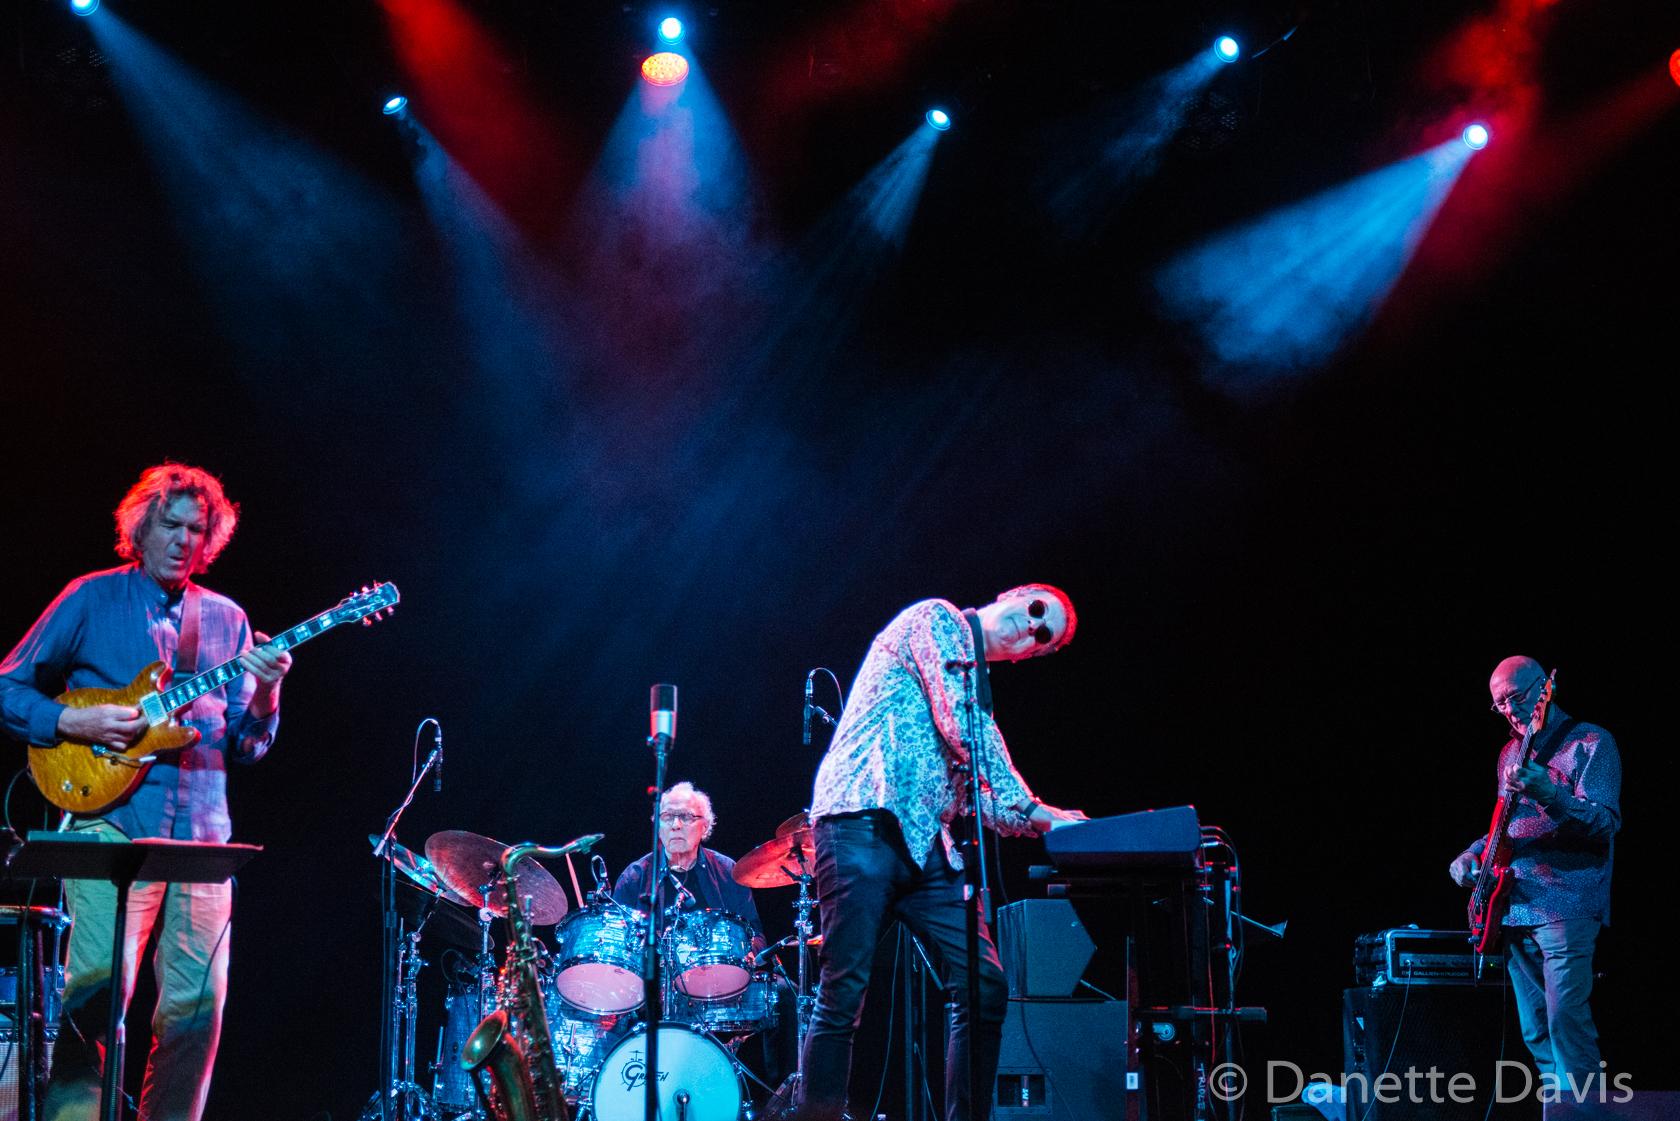 L-R: John Etheridge, John Marshall, Theo Travis, and Roy Babbington, Soft Machine, Triple Door, Seattle, 2019